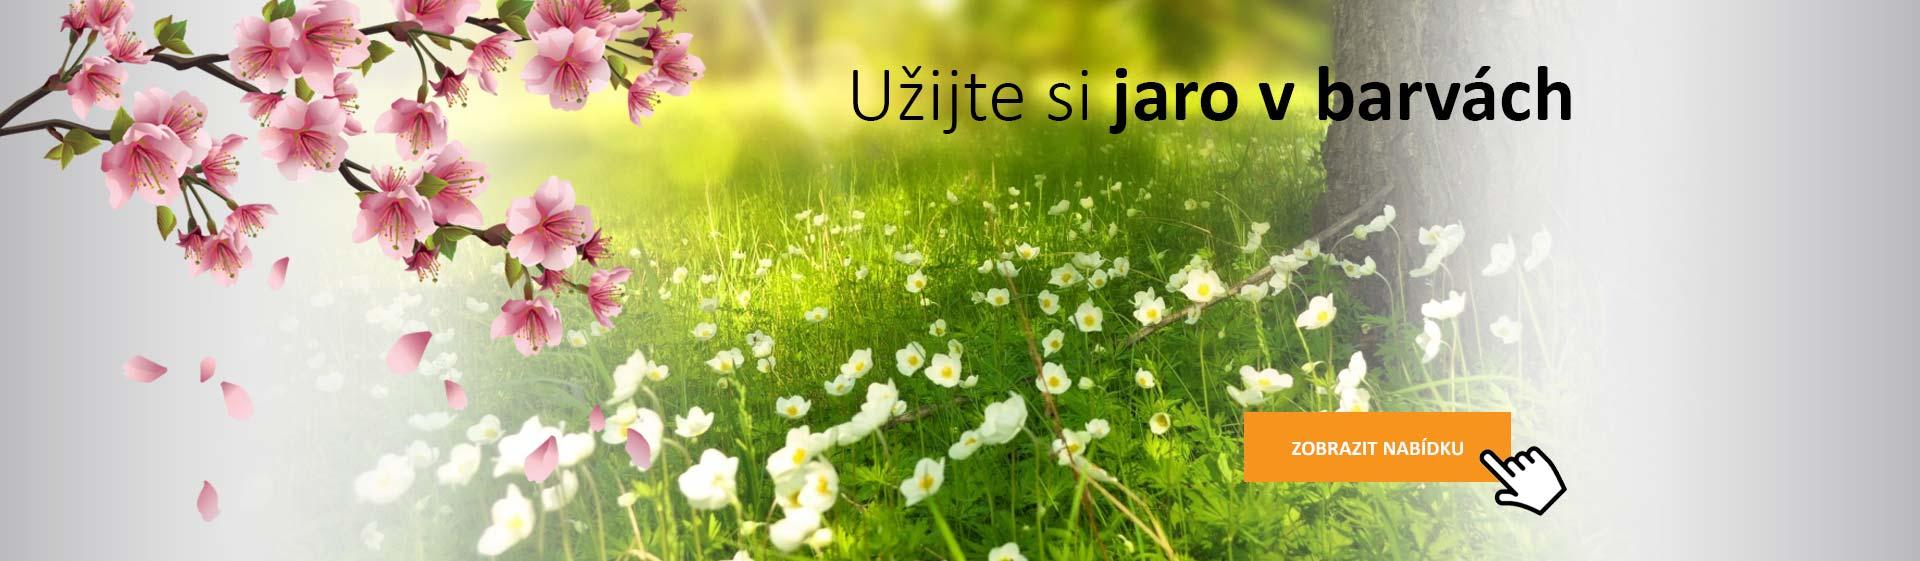 Užijte si jaro v barvách